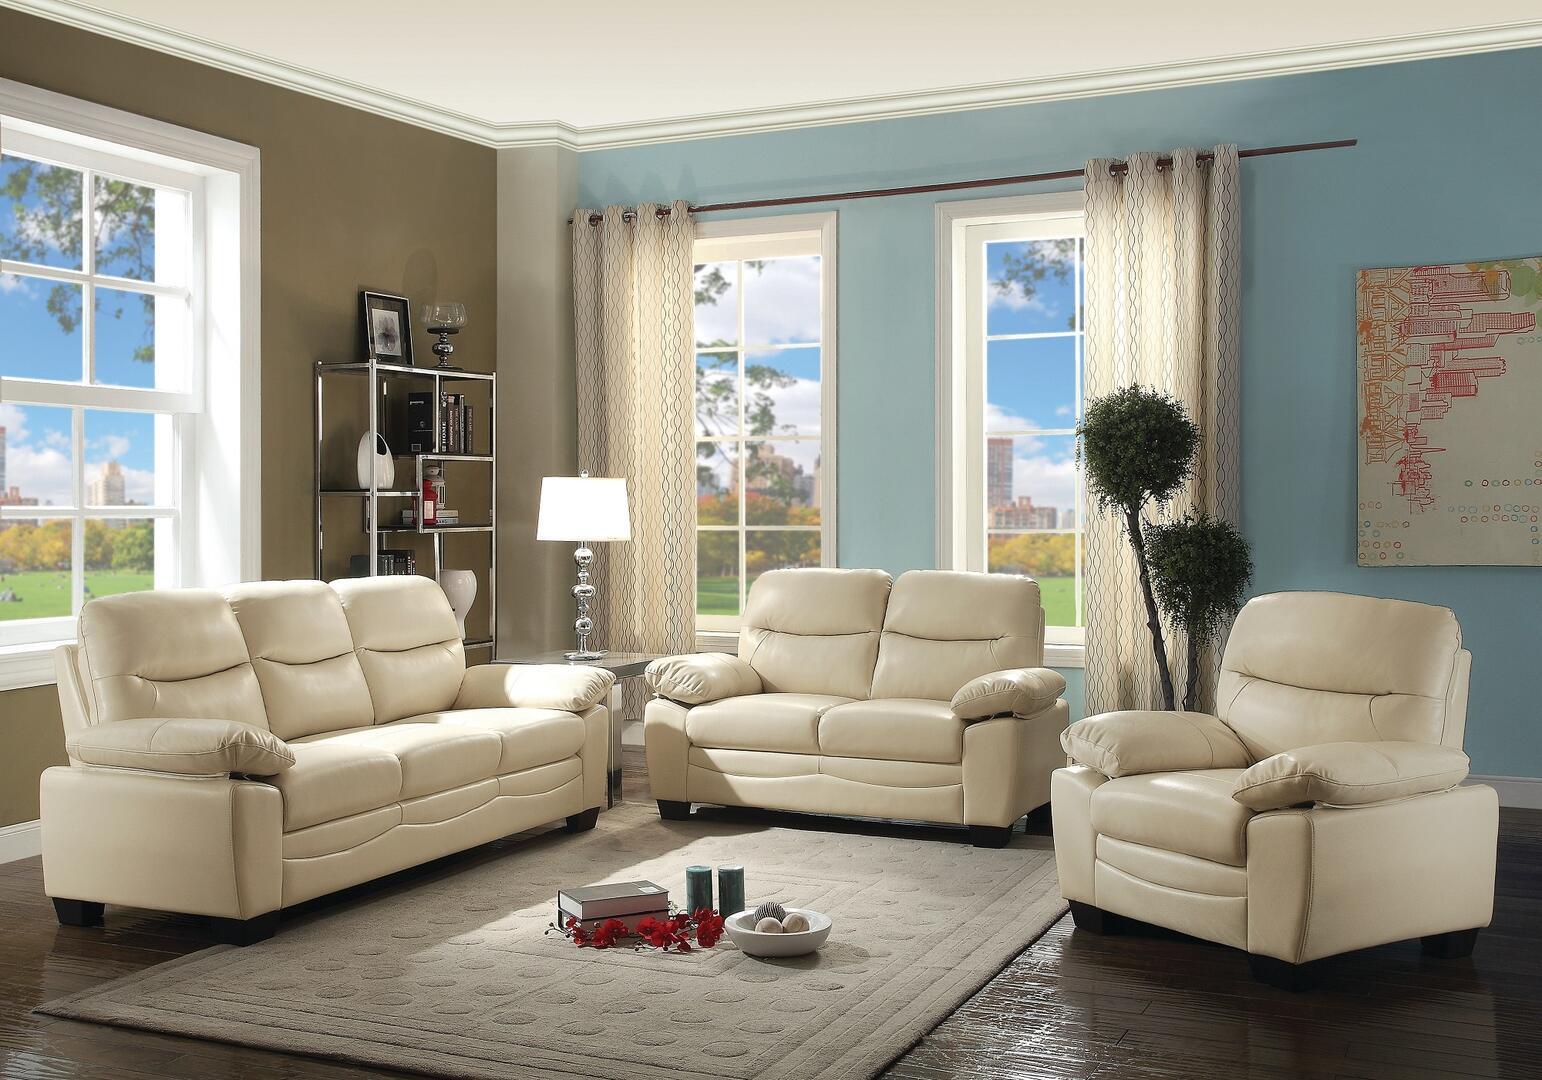 Glory furniture g680set living room sets appliances for Living room of satoshi tax